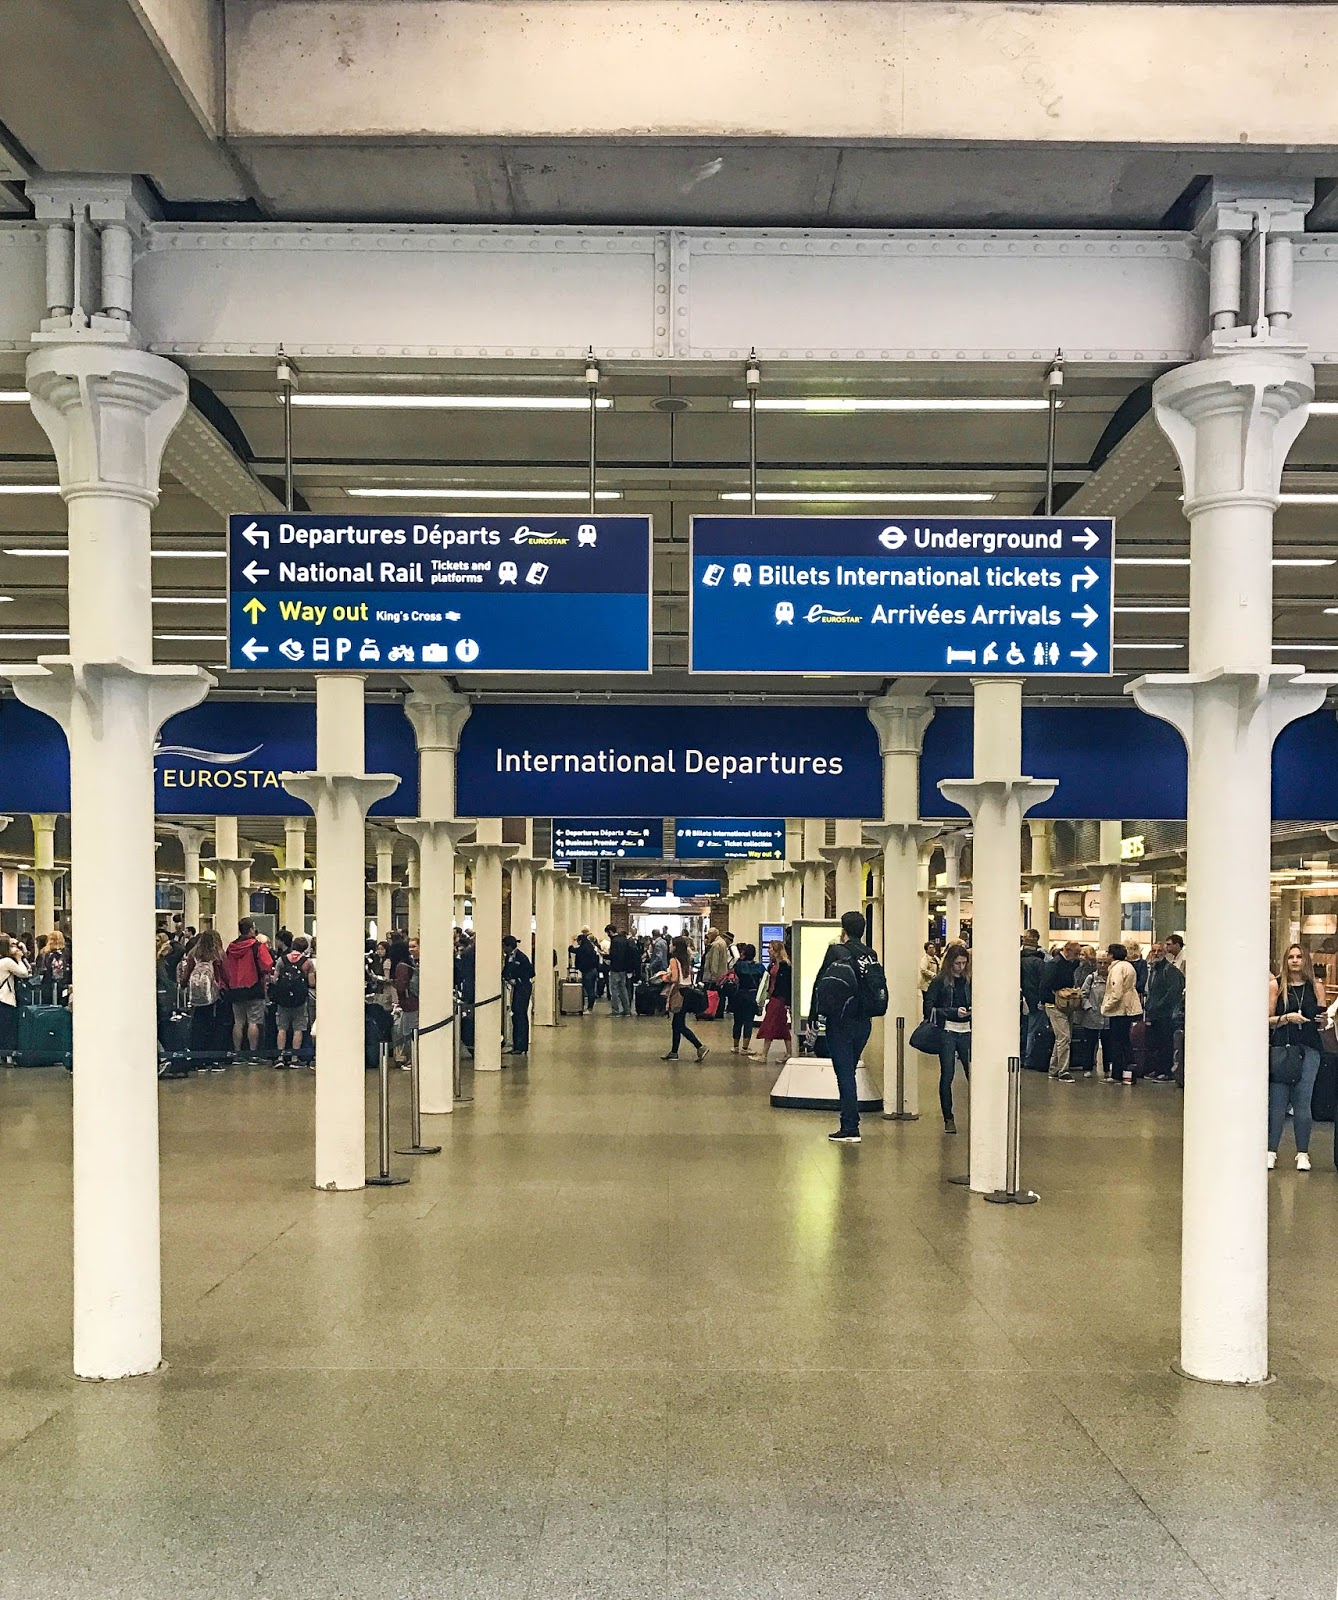 St Pancras Eurostar departure gate